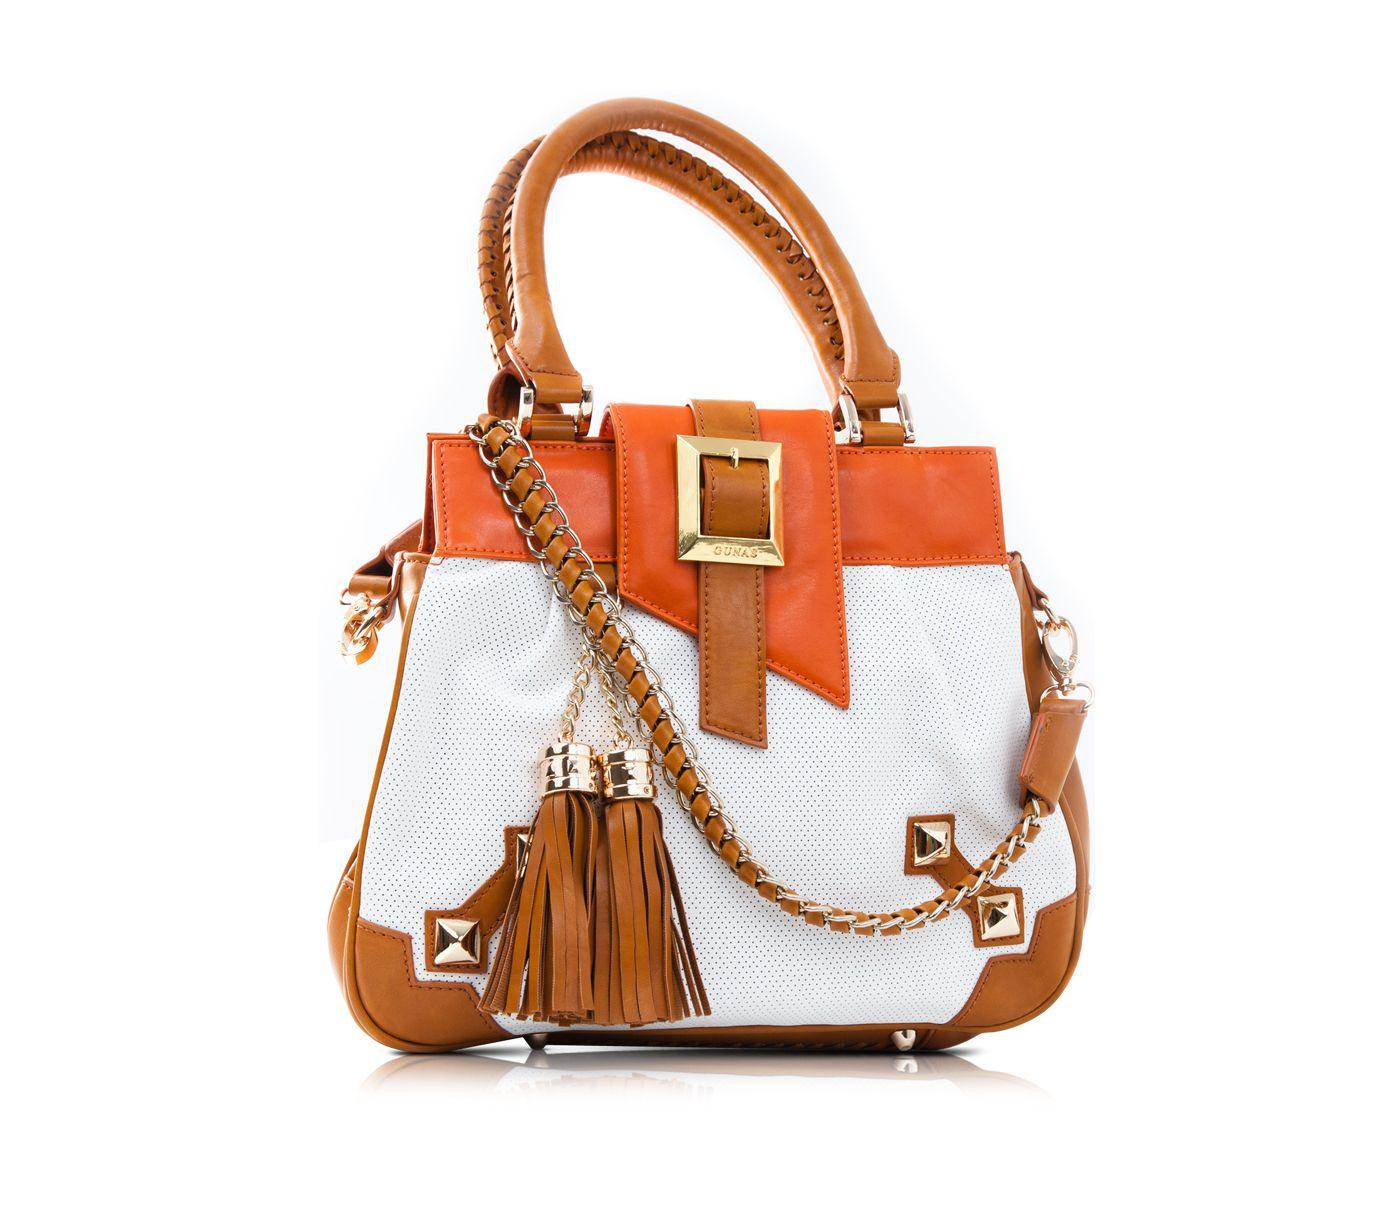 One Of The Cutest Vegan Handbags Ever From Eco Friendly Luxury Brand Gunas